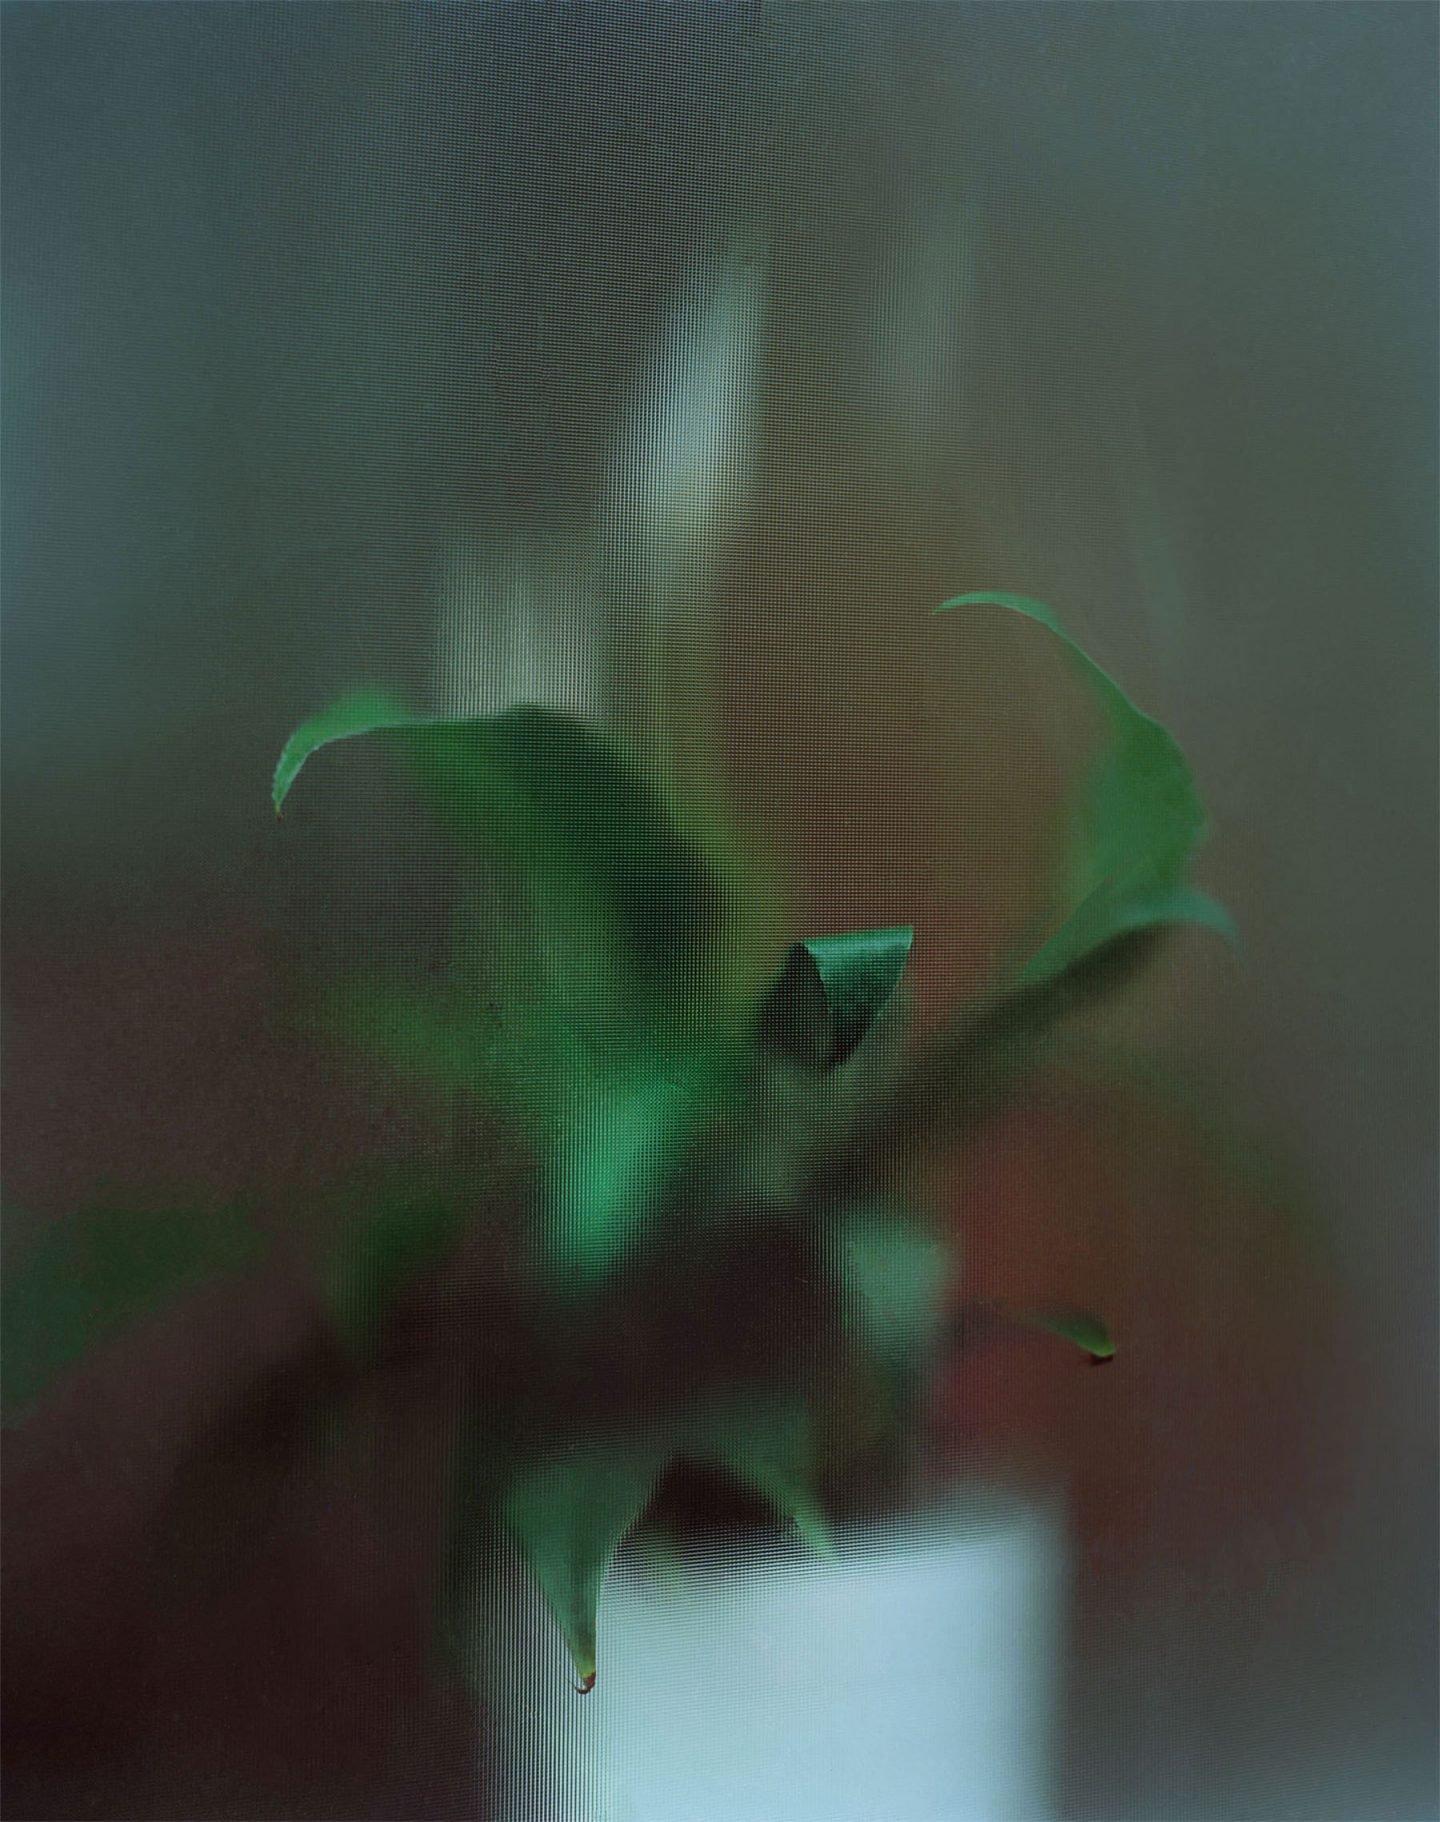 iGNANT-Photography-Tim-Palman-Wellard-001